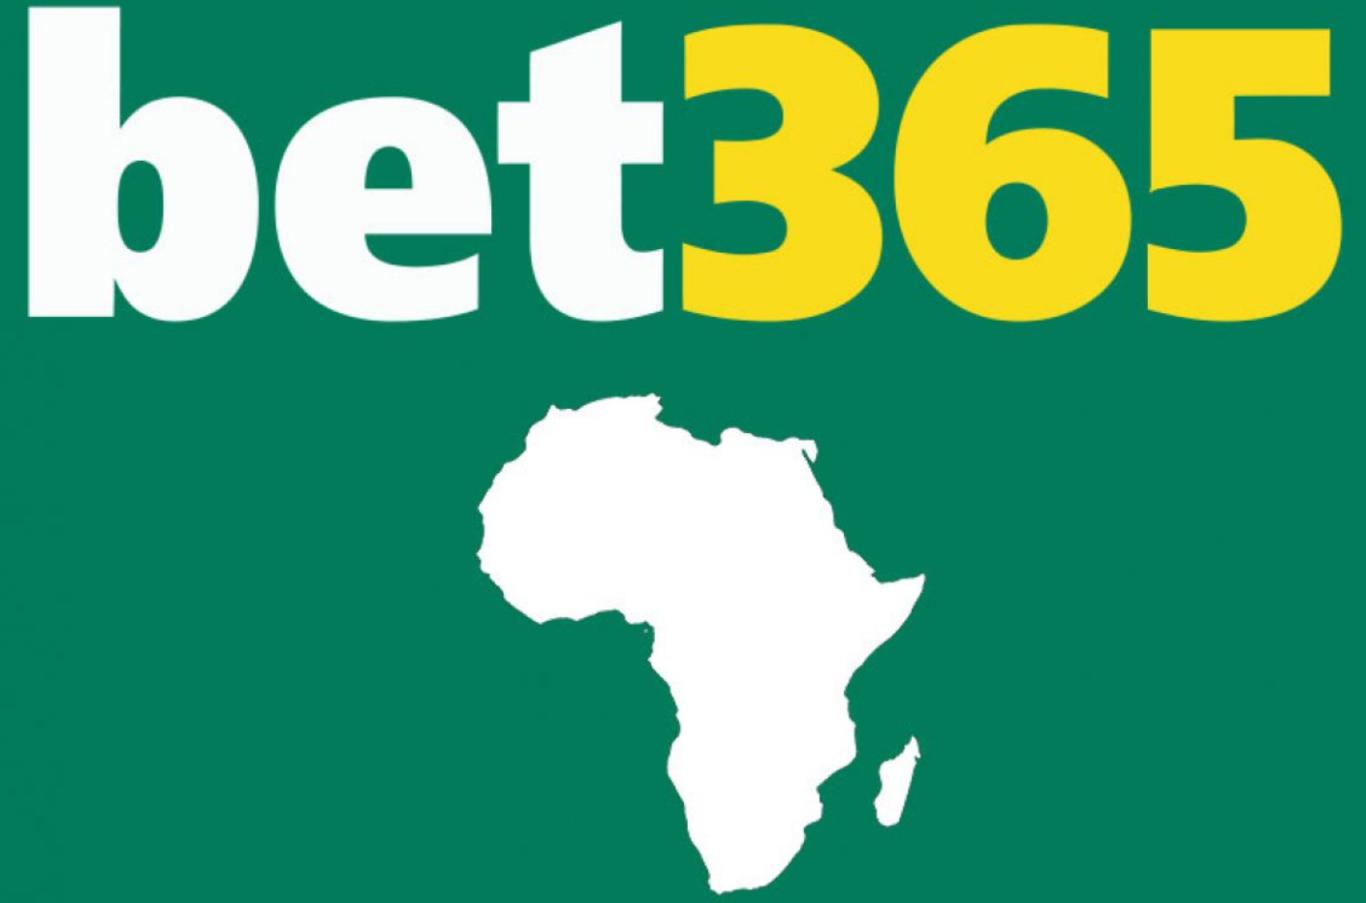 Bet365 Bookmakers' Bonuses